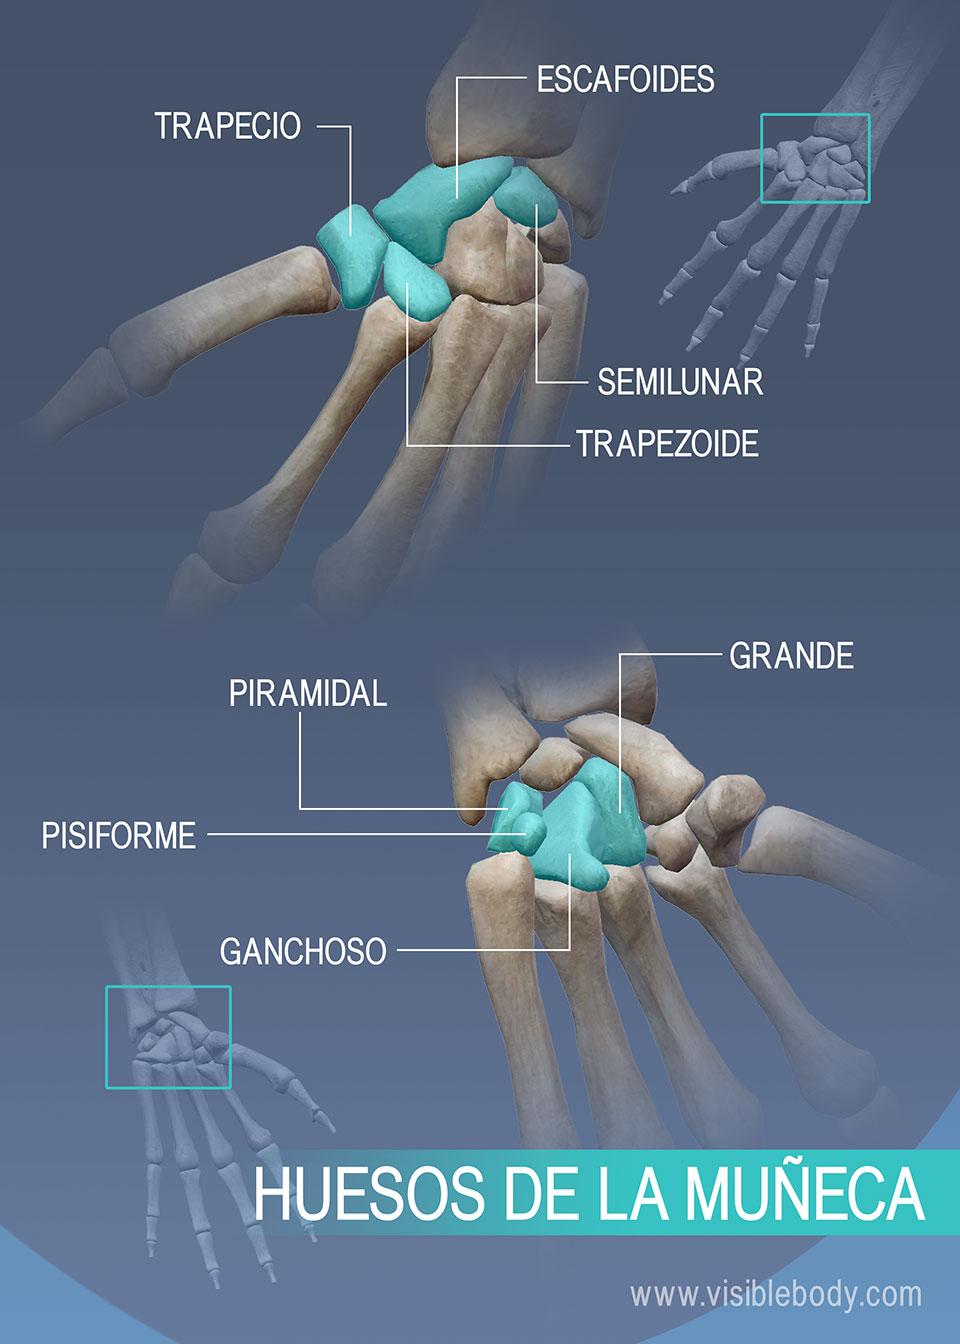 Trapecio, escafoides, semilunar, trapezoide, hueso grande, piramidal, pisiforme y ganchoso Huesos de la muñeca